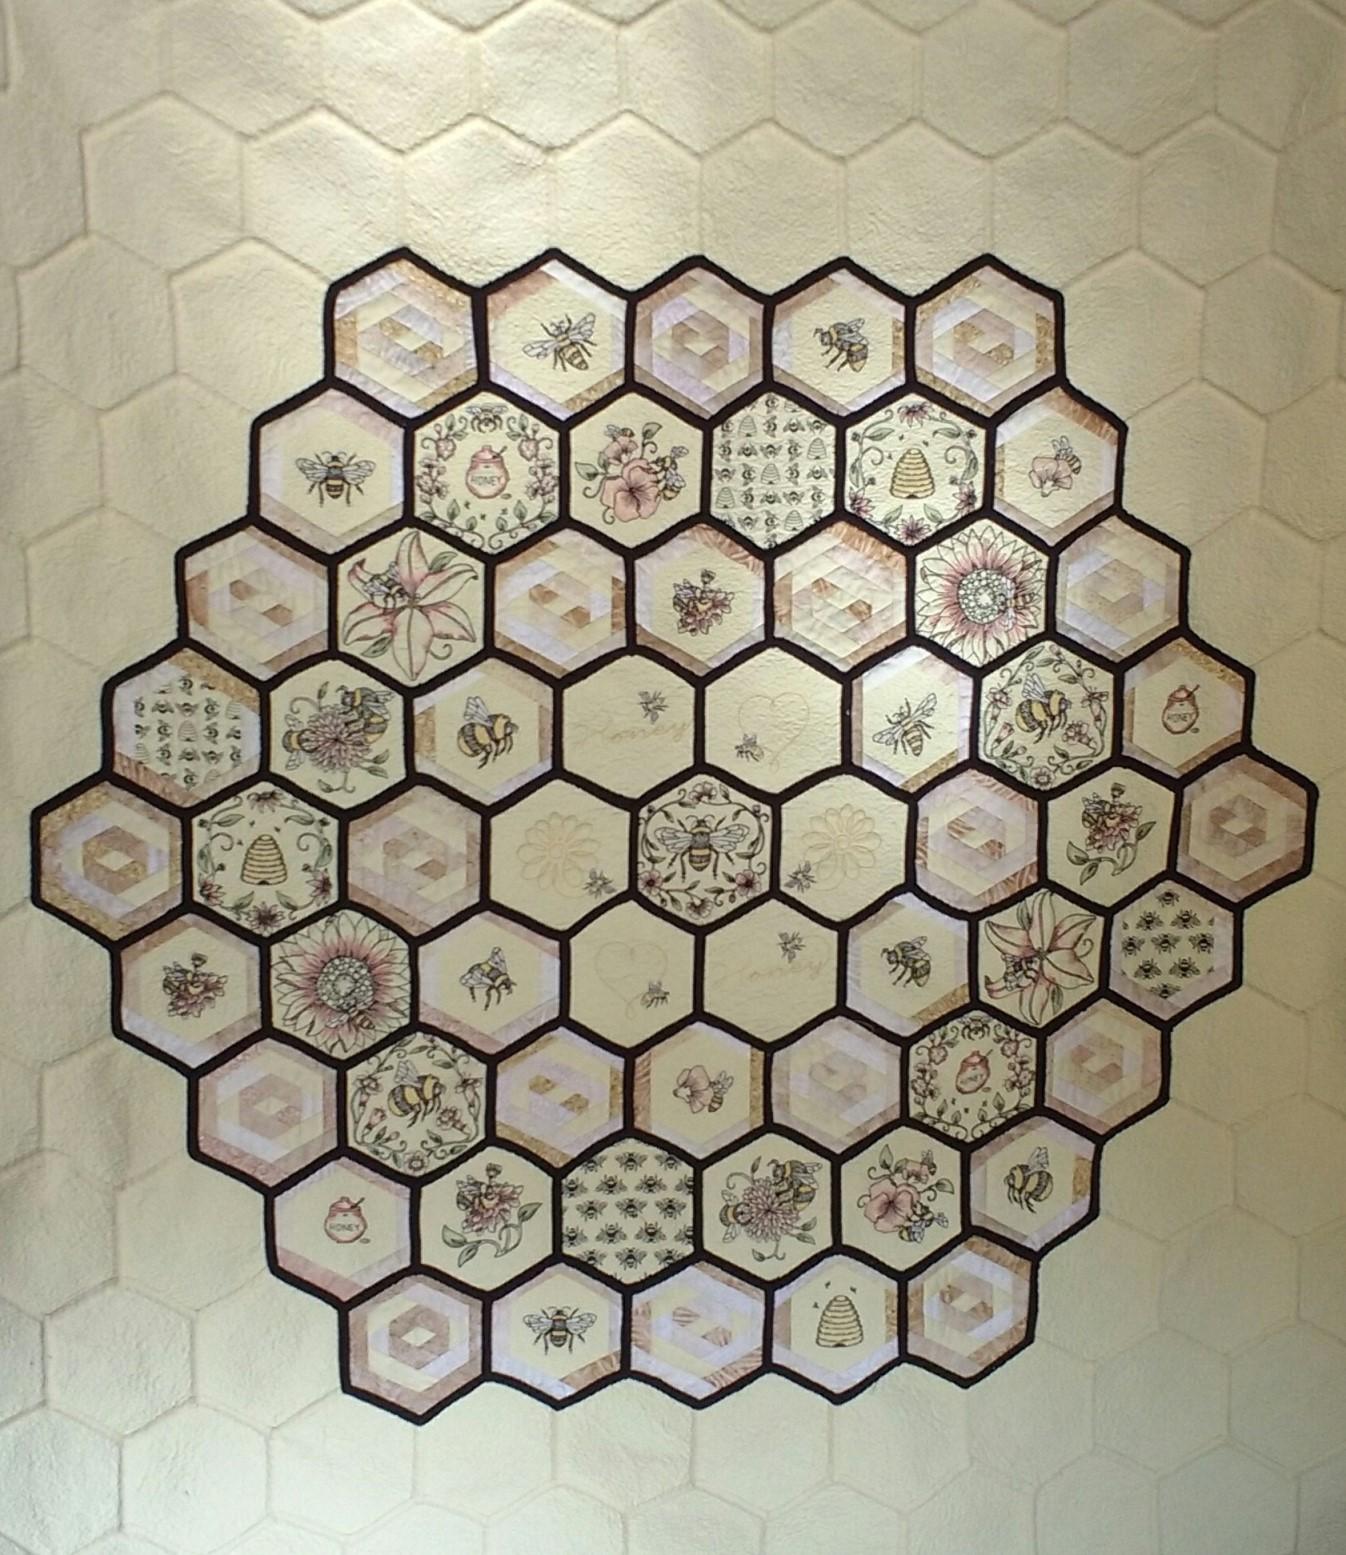 Name:  Honeycomb center.jpg Views: 364 Size:  475.8 KB